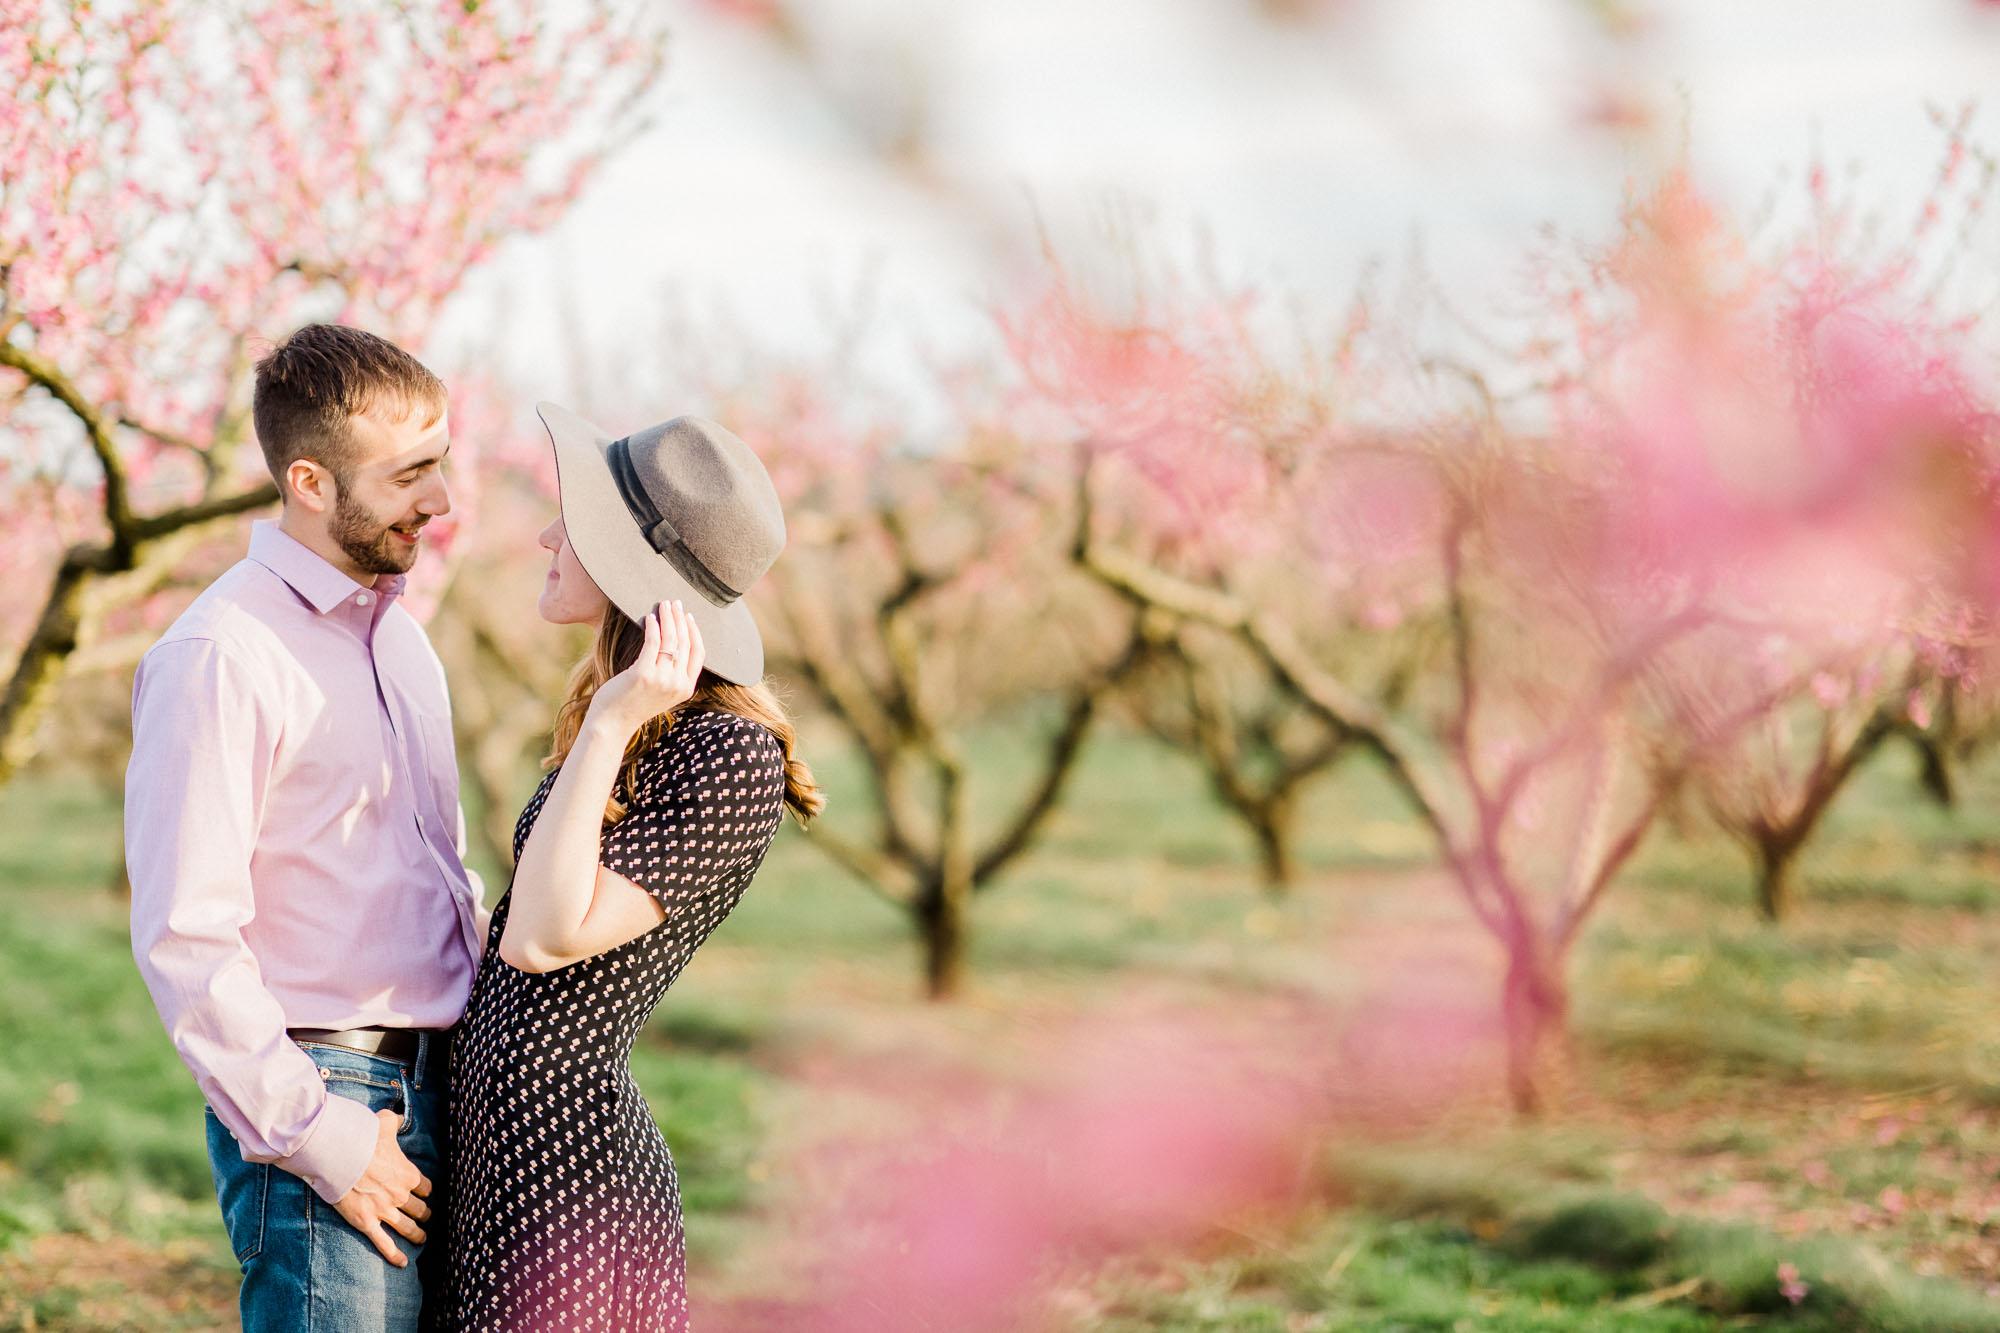 Rohrbachs-Spring-cherry-blossom-engagement-7500.jpg